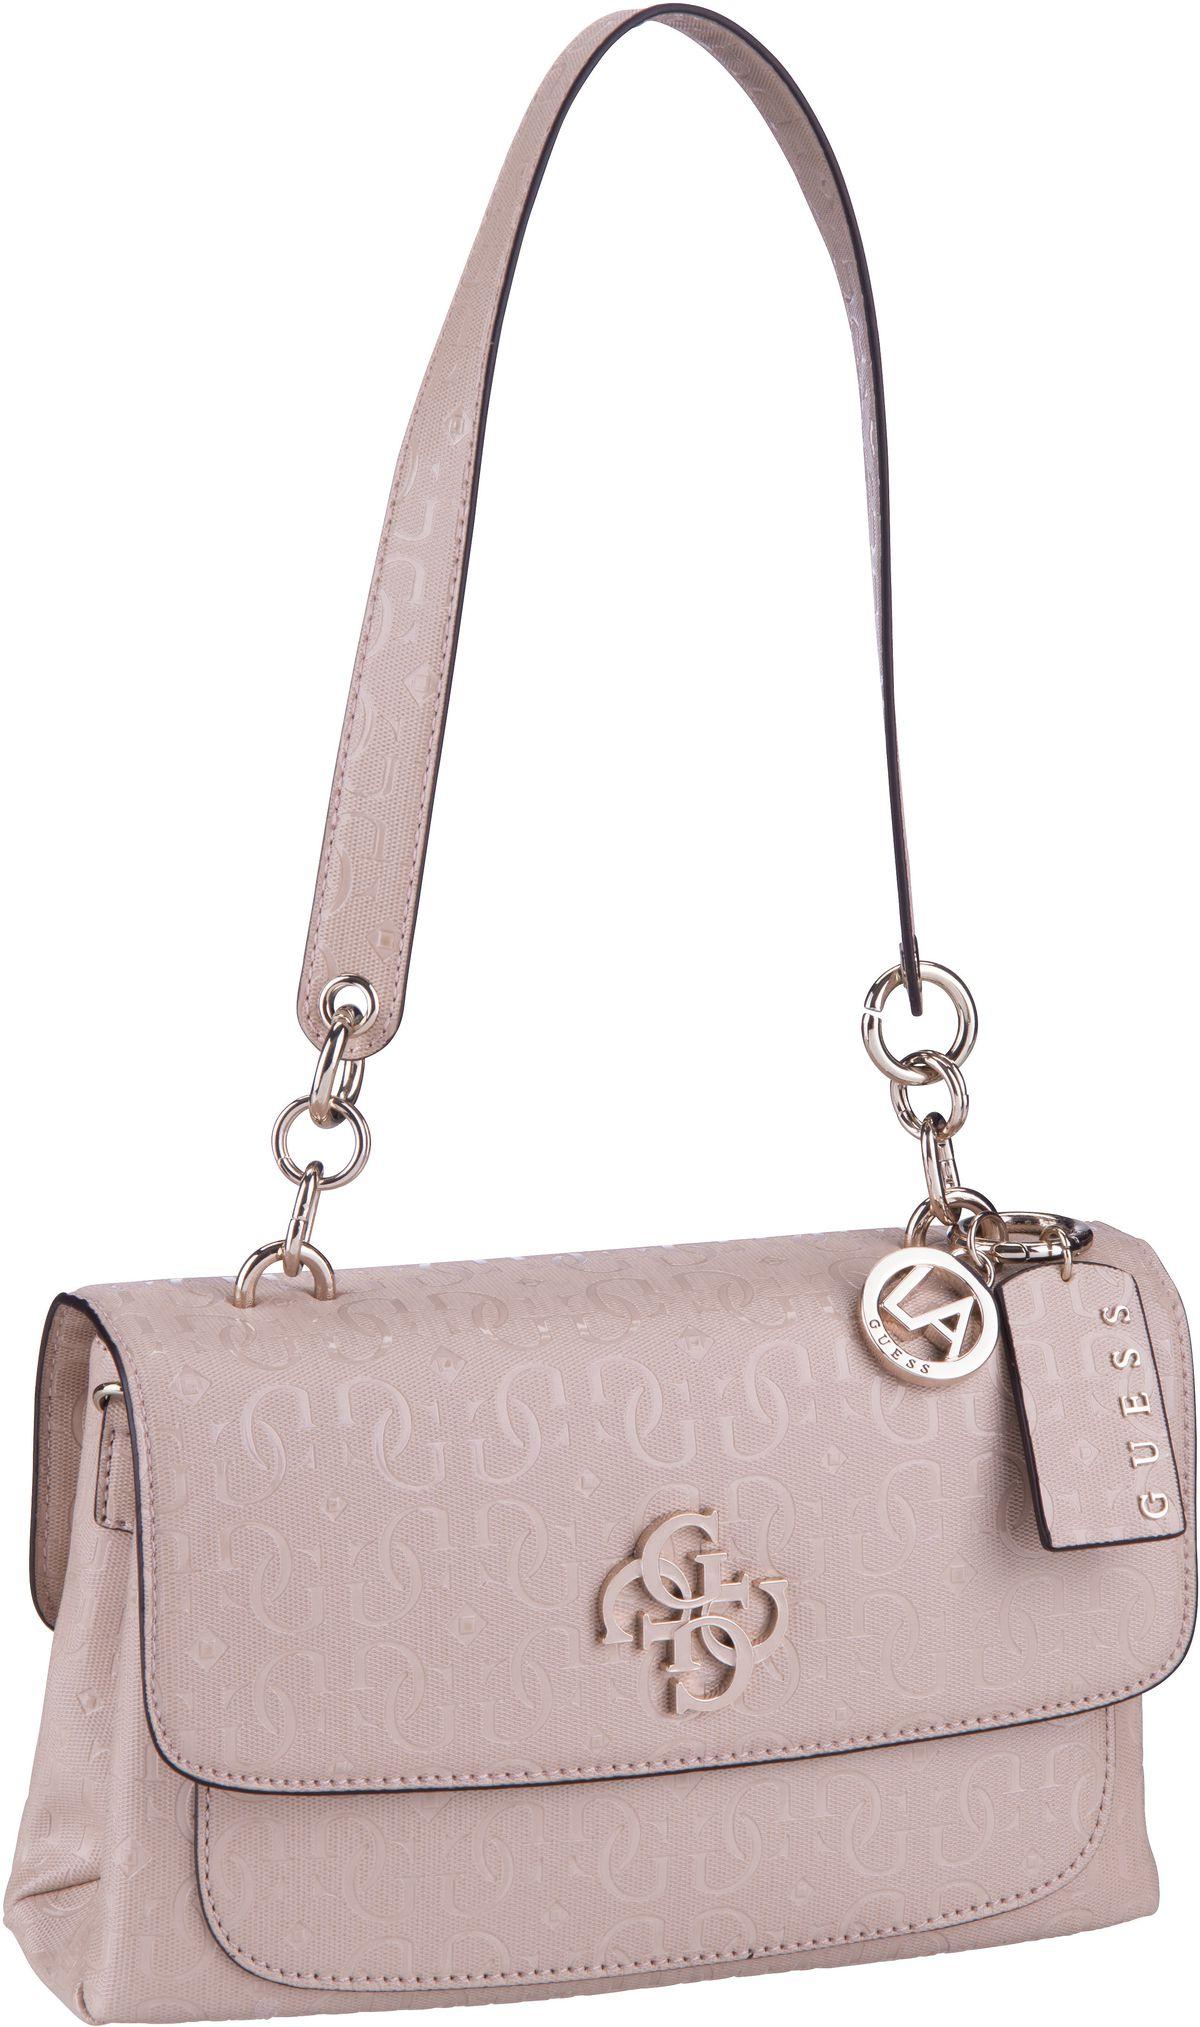 Handtasche Chic Shine Shoulder Bag Blush